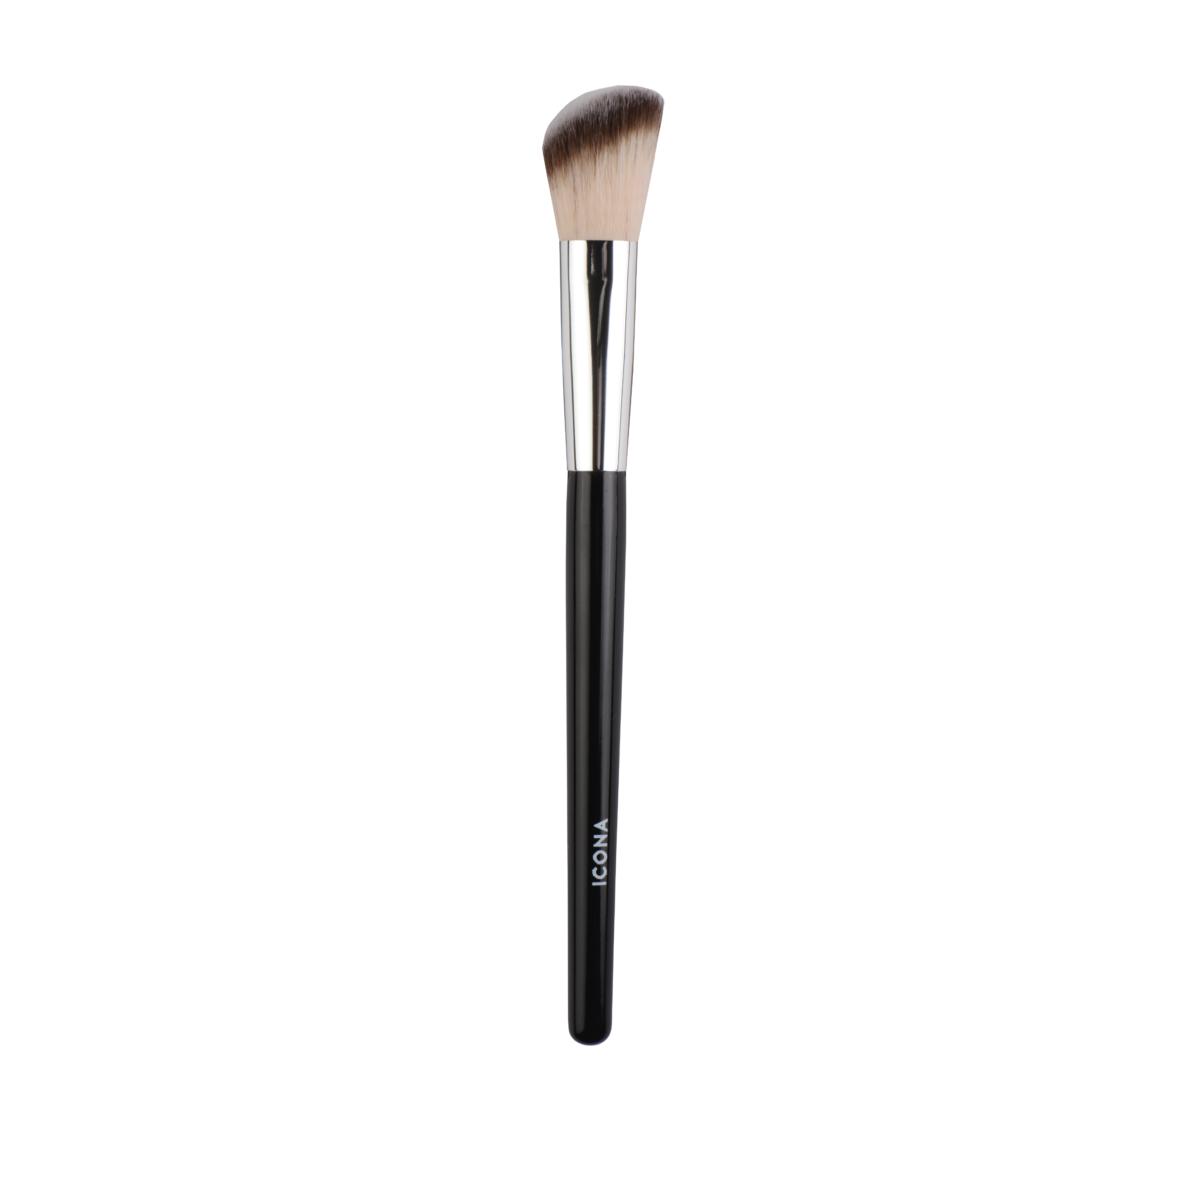 1011_Pennello viso BLUSH 2 - Icona Make up